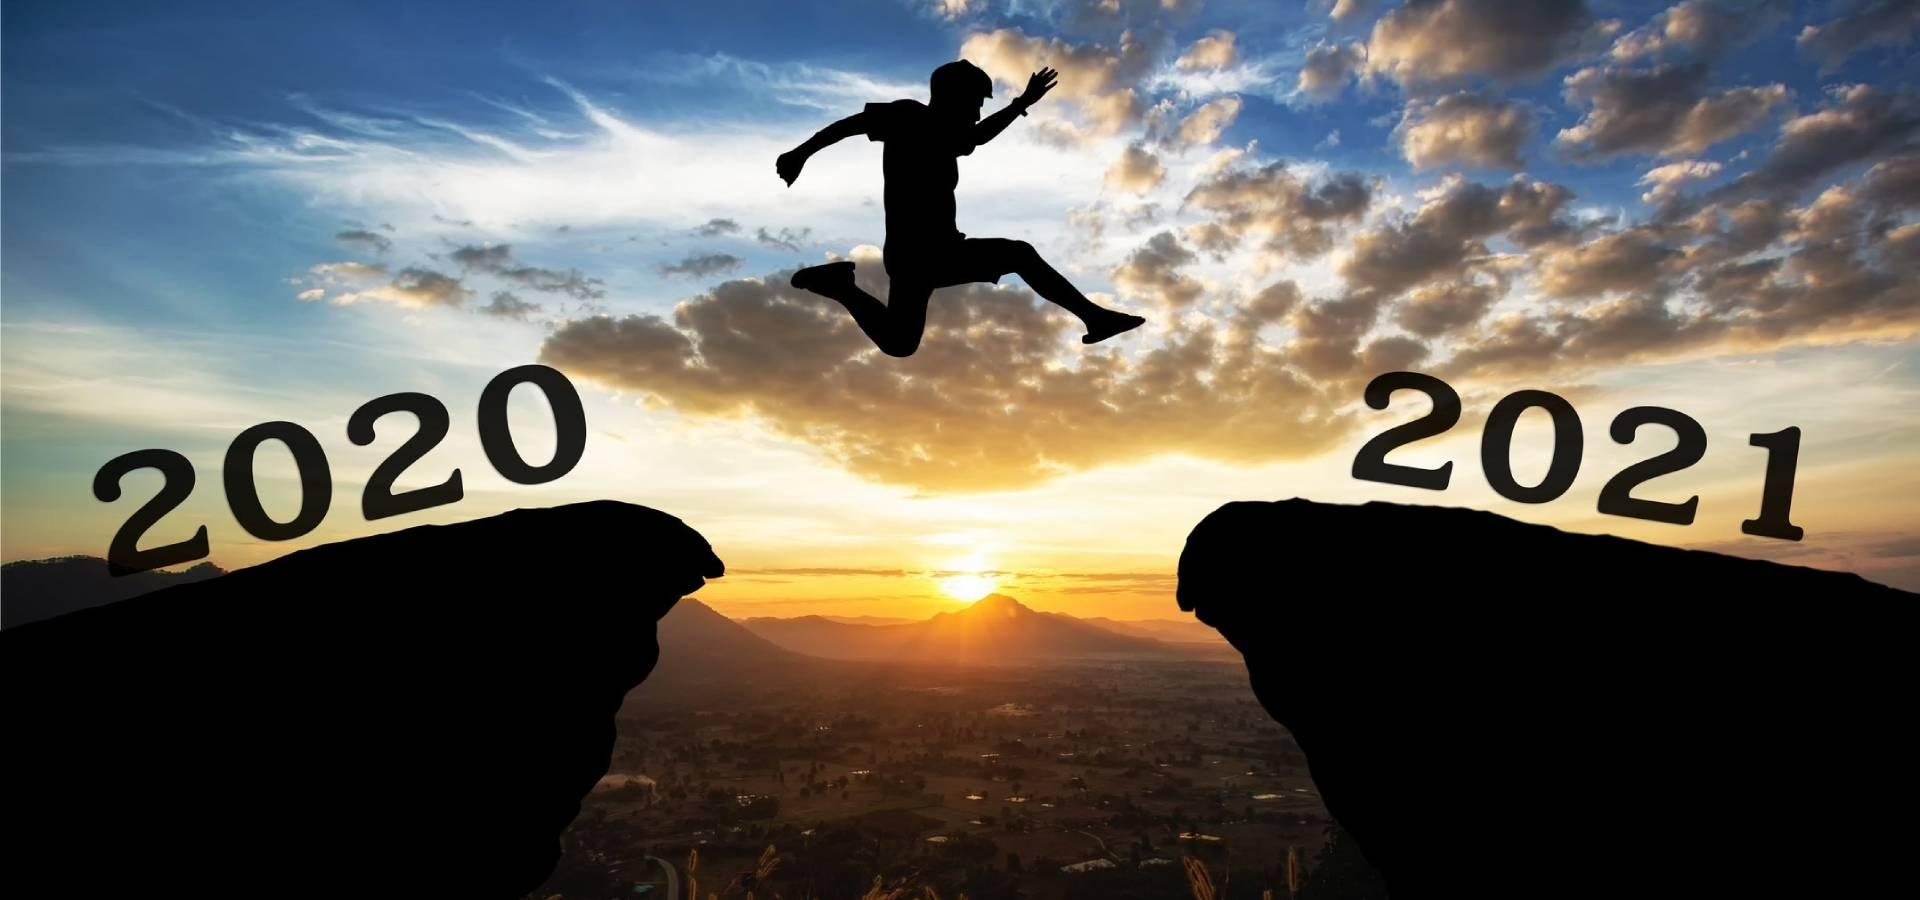 new-year-2021-wallpaper